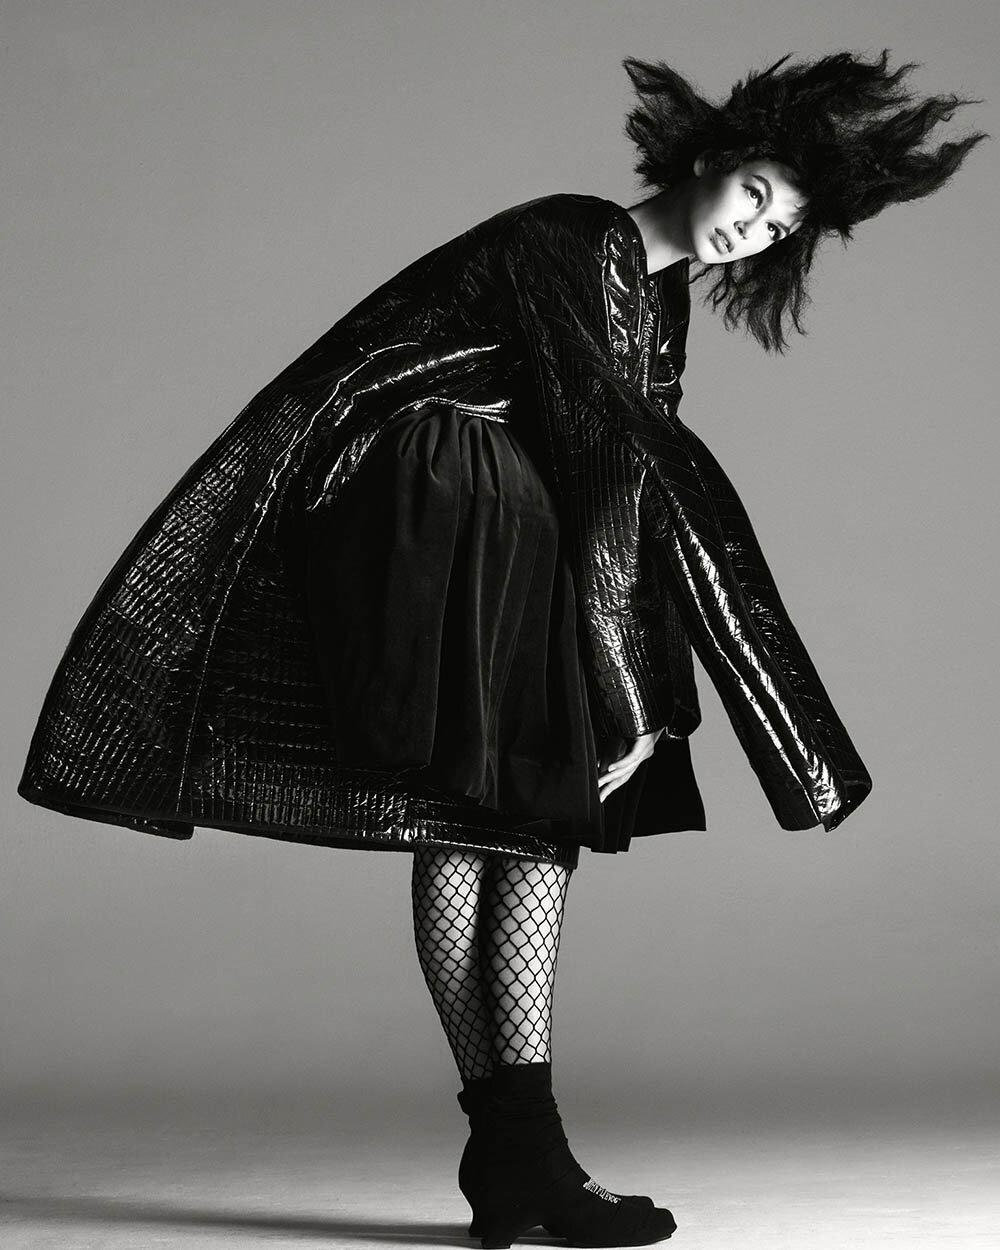 Kaia-Gerber-covers-British-Vogue-October-2019-by-Steven-Meisel-7.jpg